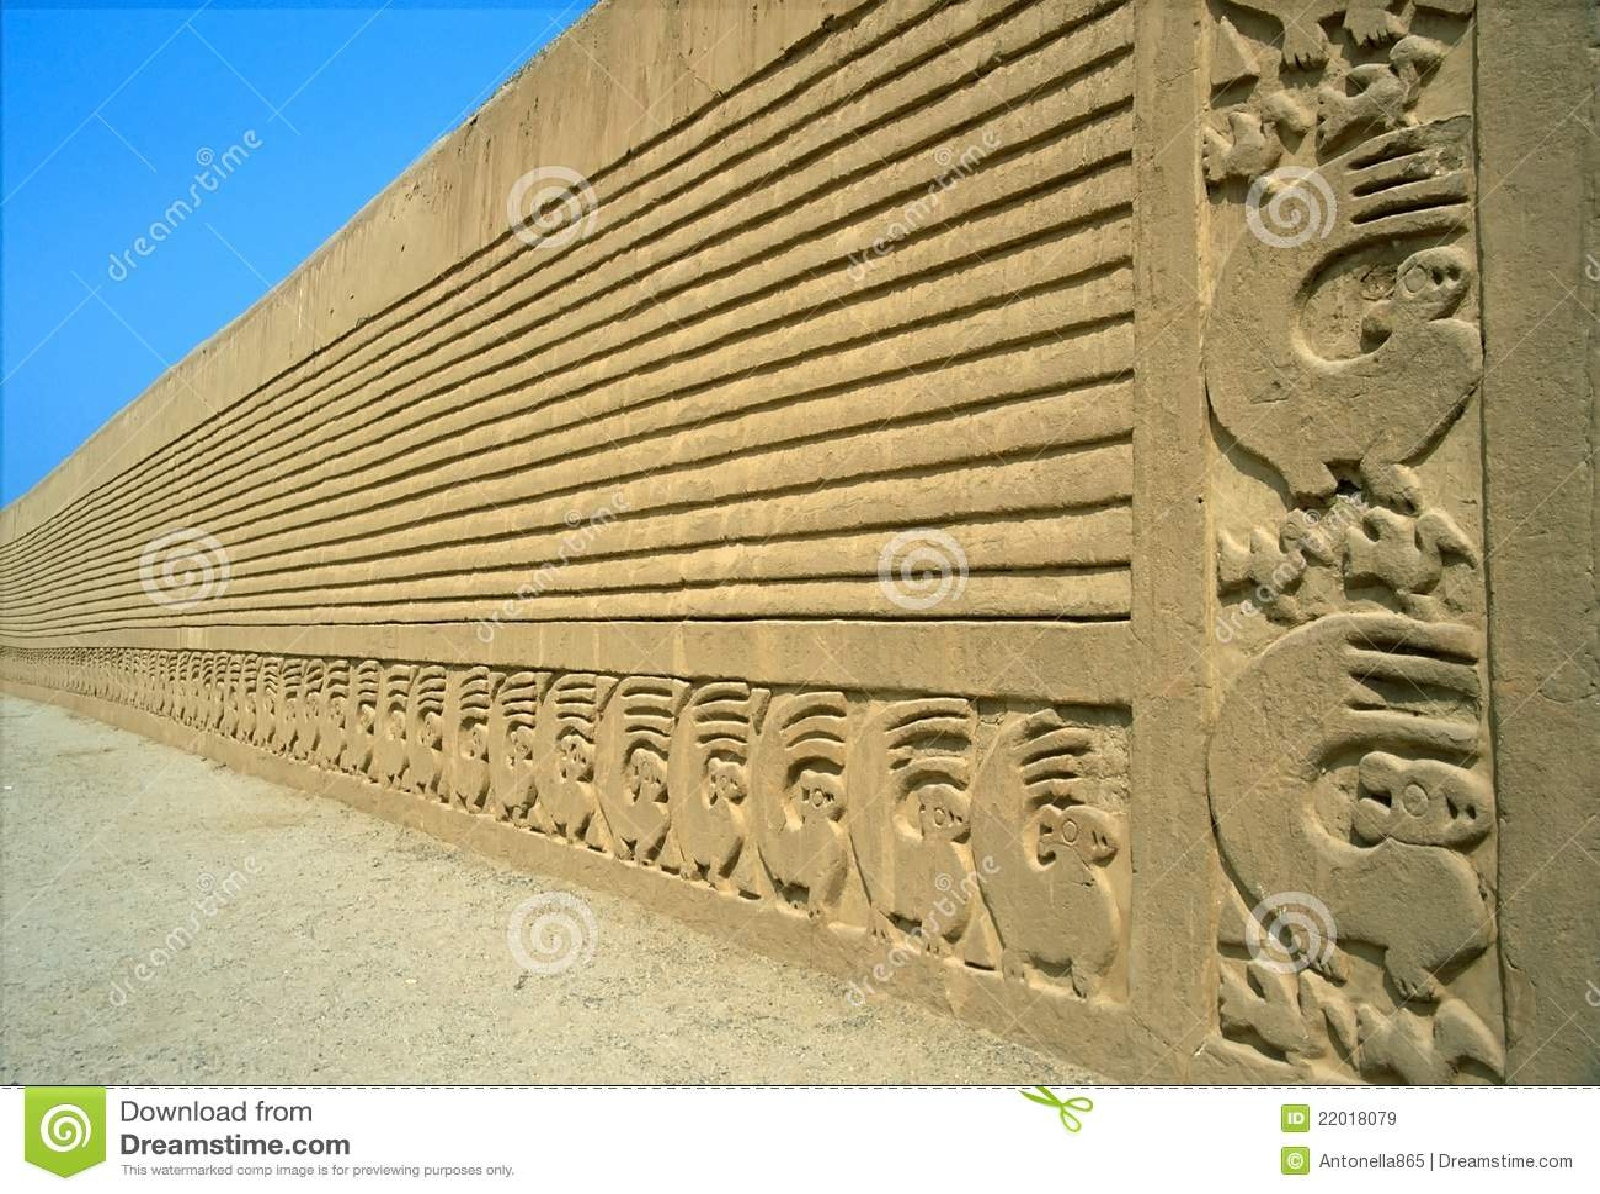 Mure a cinzeladura, Chan Chan, ¹ de PerÃ